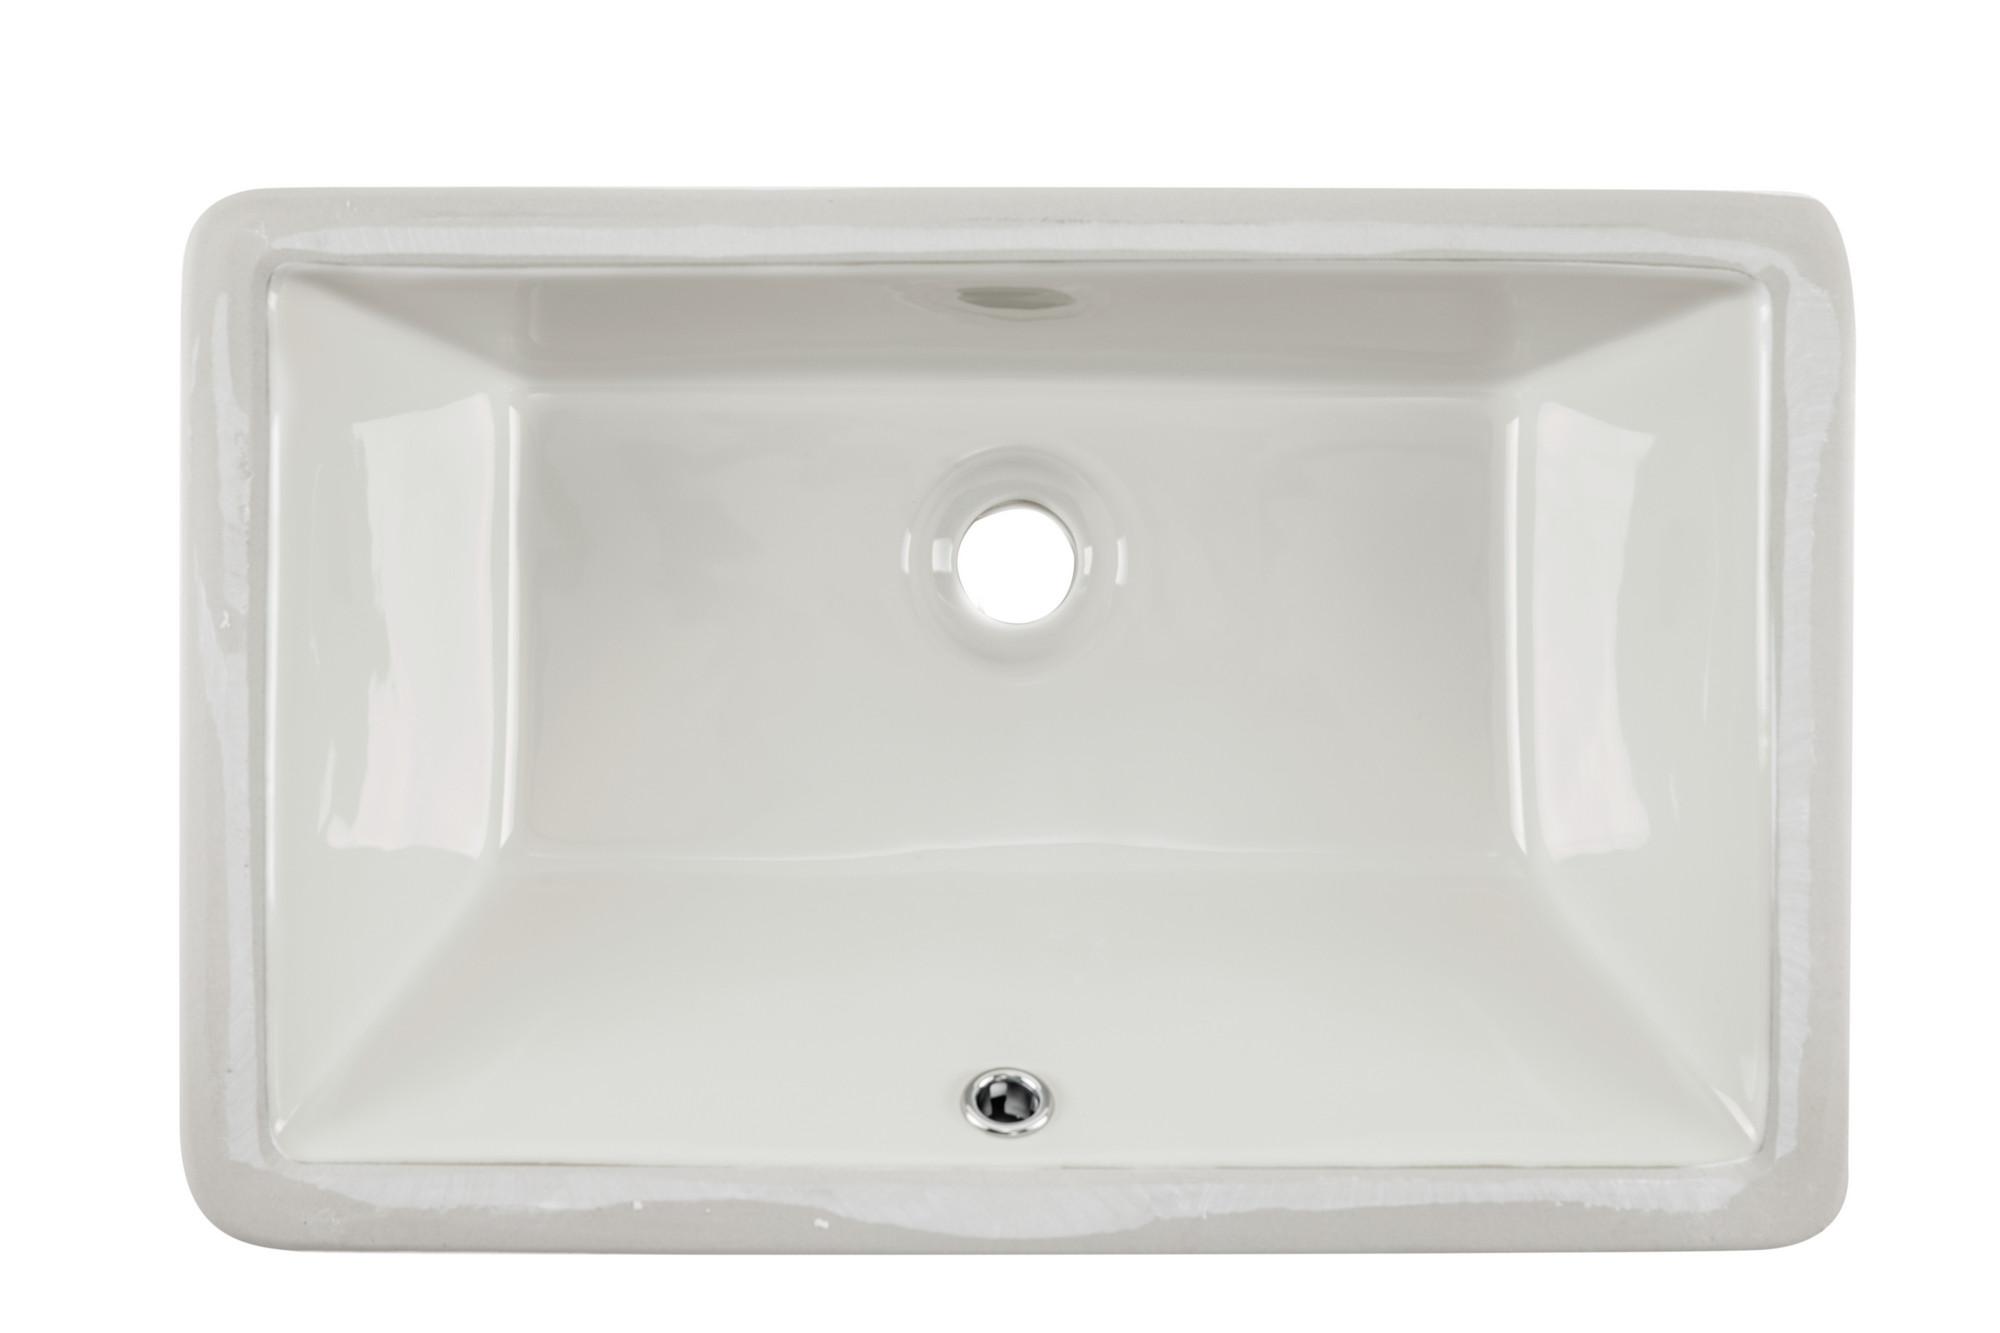 Cahaba CA425T18-B 18-1/2 x 11 Biscuit Glazed Porcelain Bathroom Sink